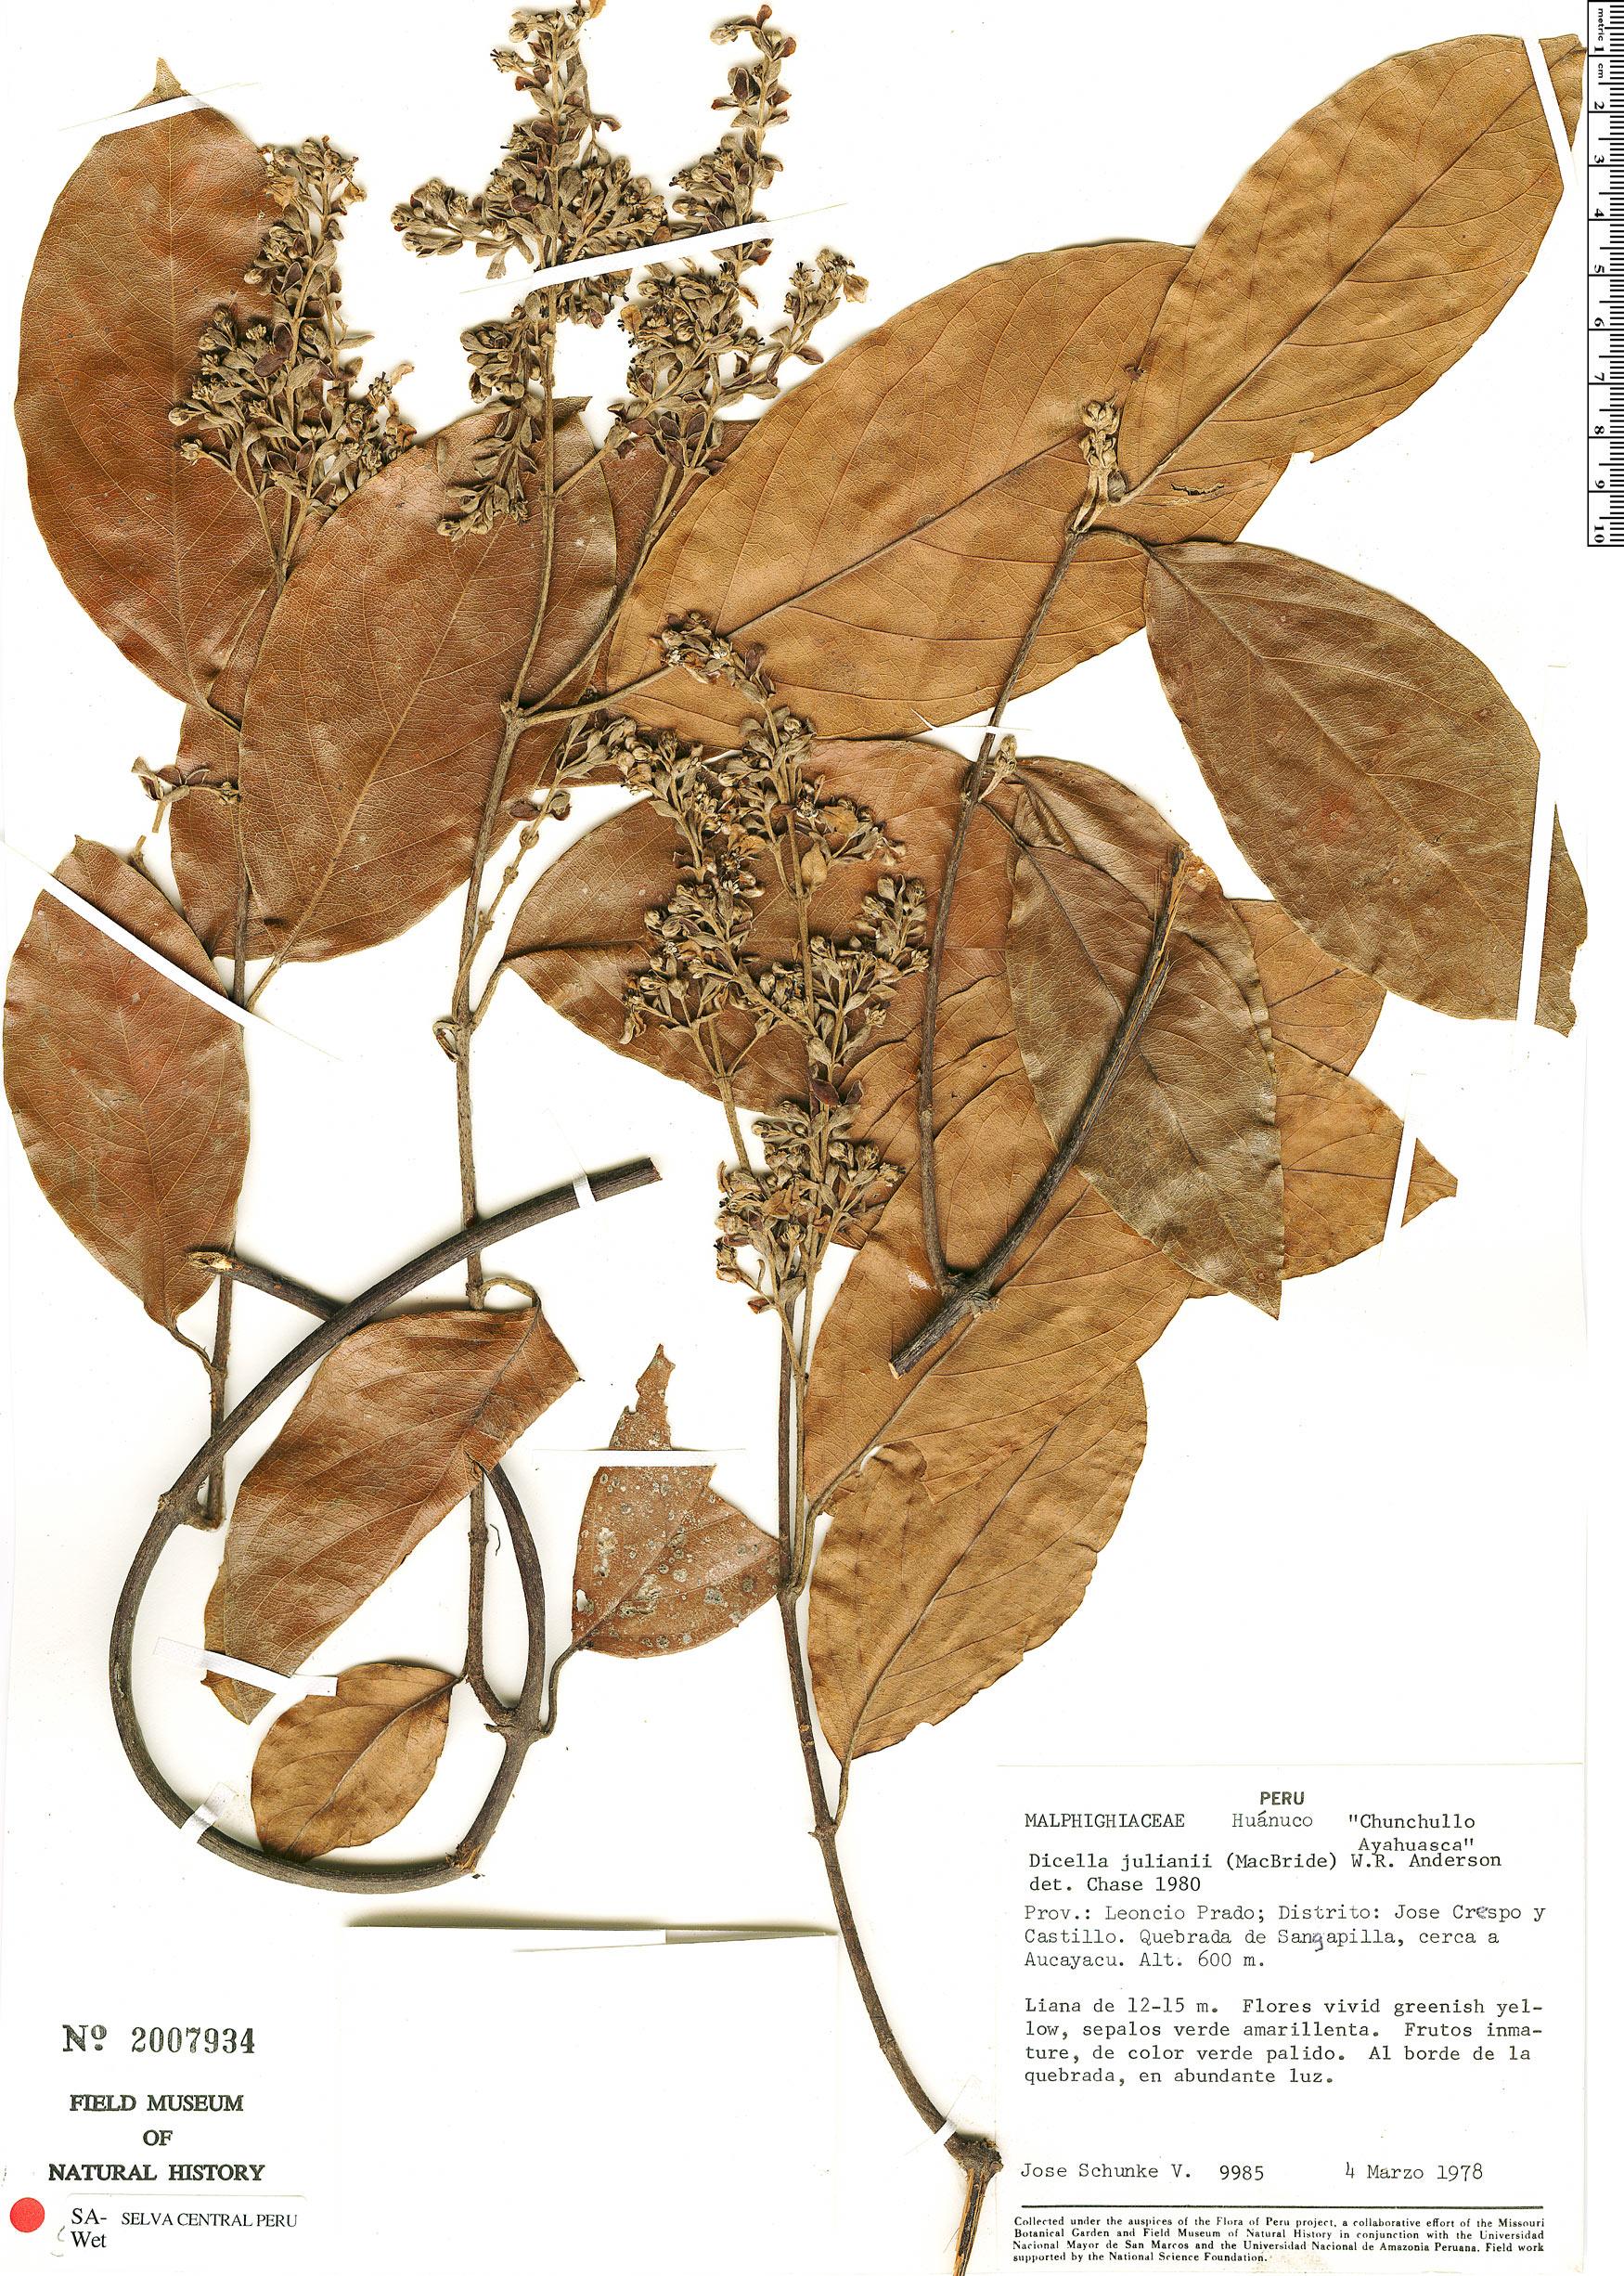 Specimen: Dicella julianii